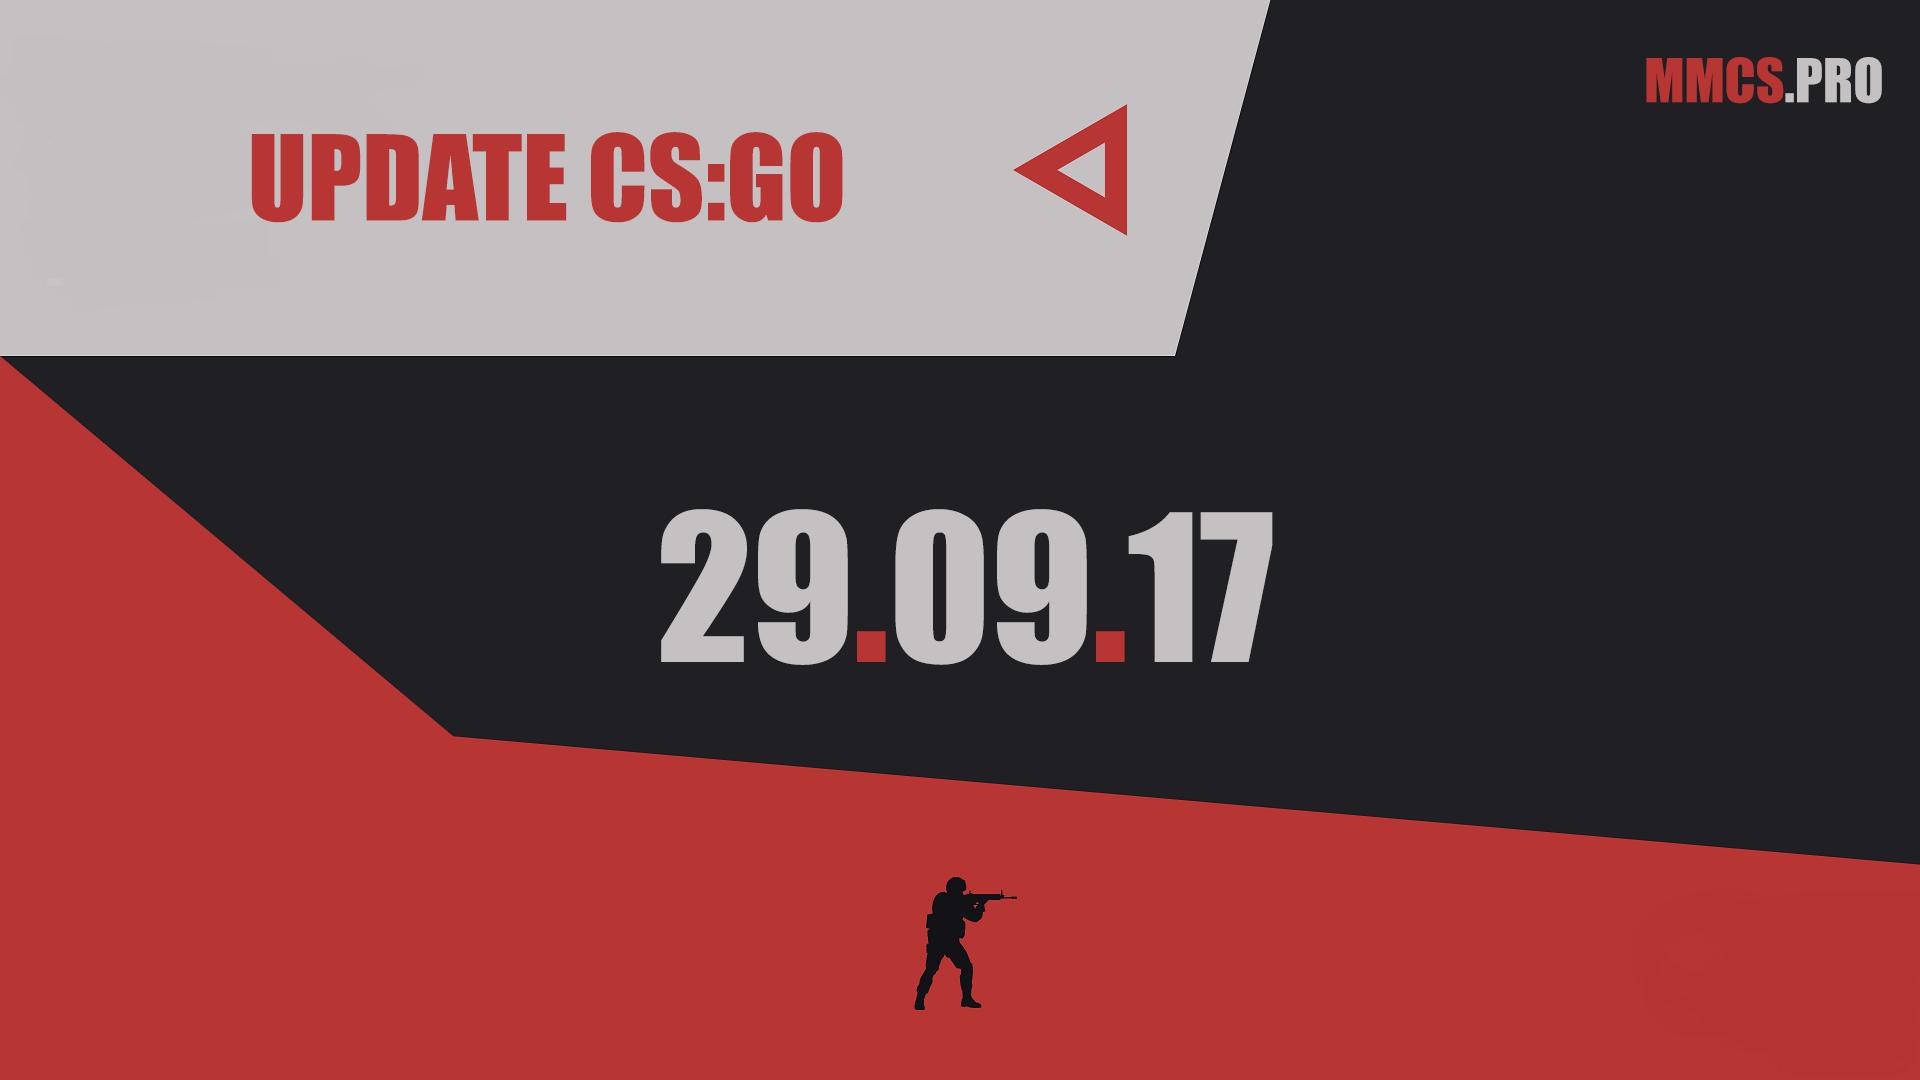 https://mmcs.pro/update-csgo-29-09-2017-valve/